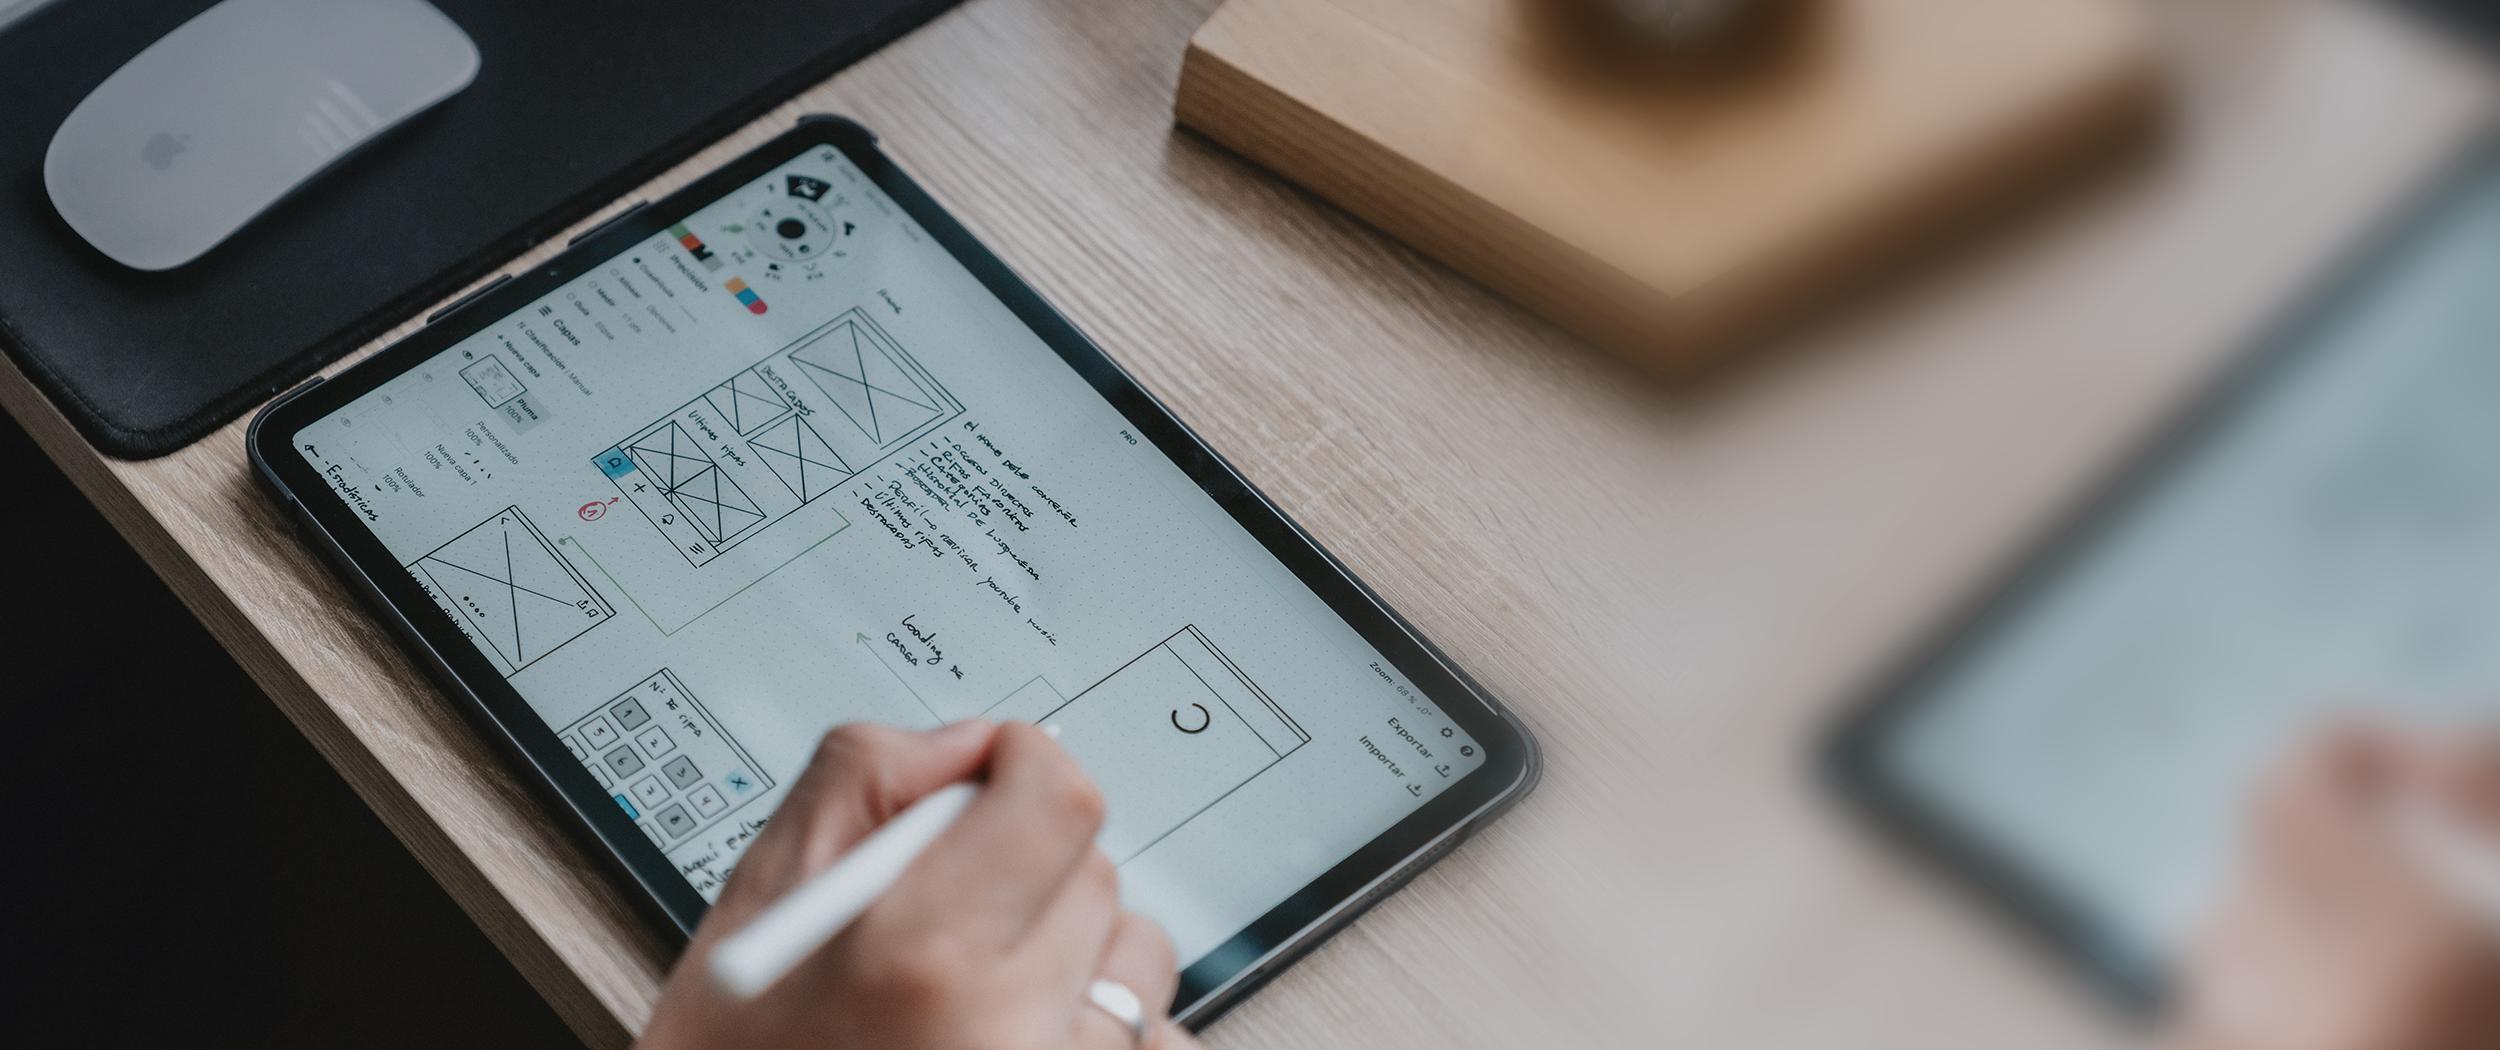 7T Mobile UI/UX Design Services - 7T is a Mobile App & Custom Software Development Company